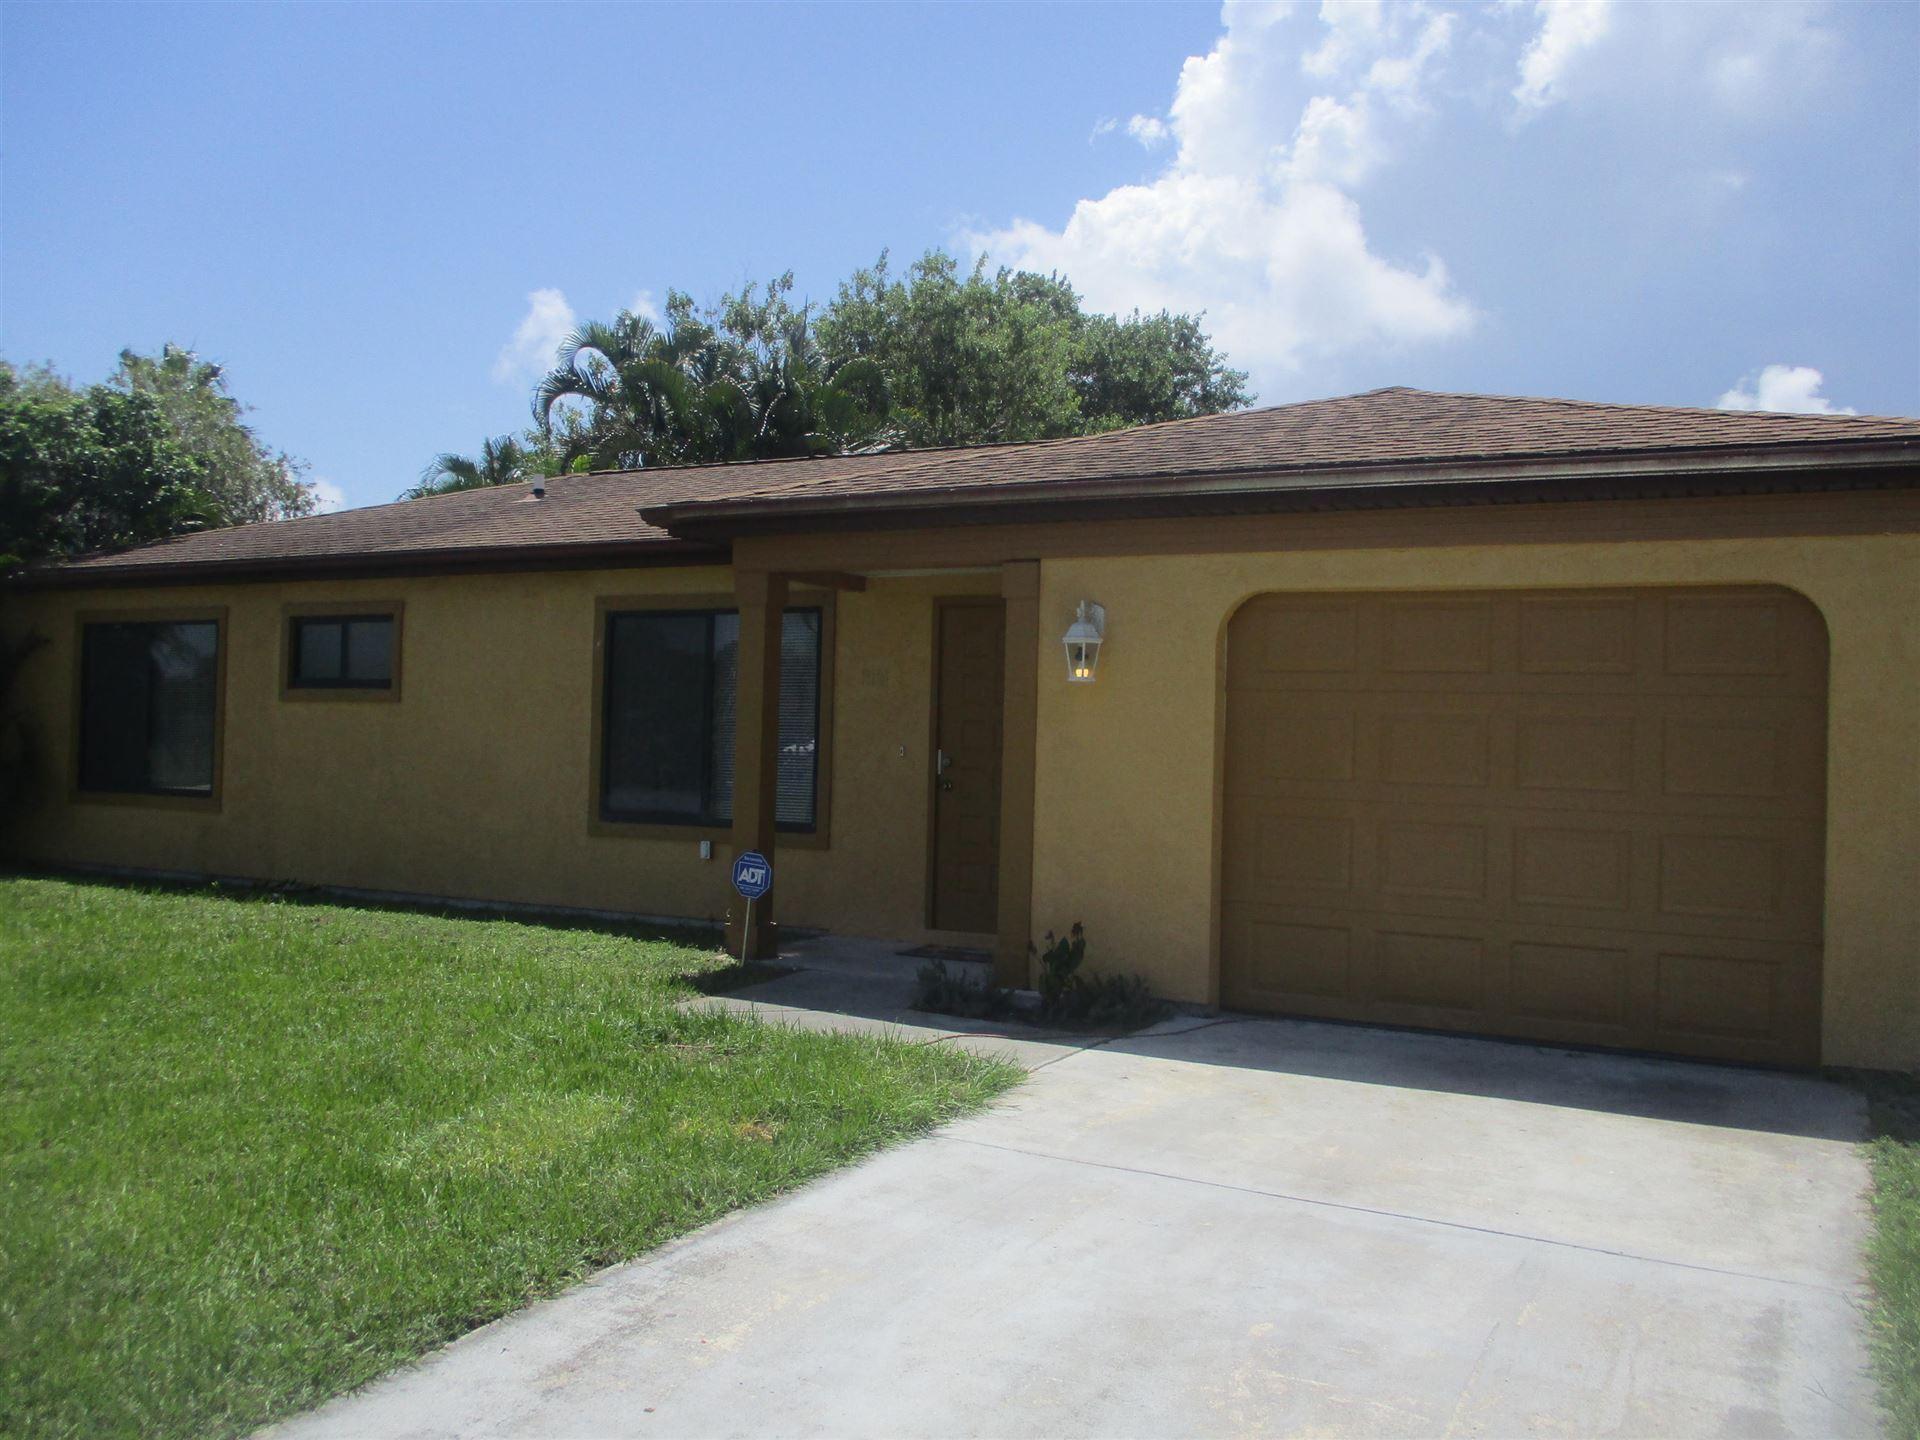 2181 SE East Dunbrooke Circle, Port Saint Lucie, FL 34952 - MLS#: RX-10704474